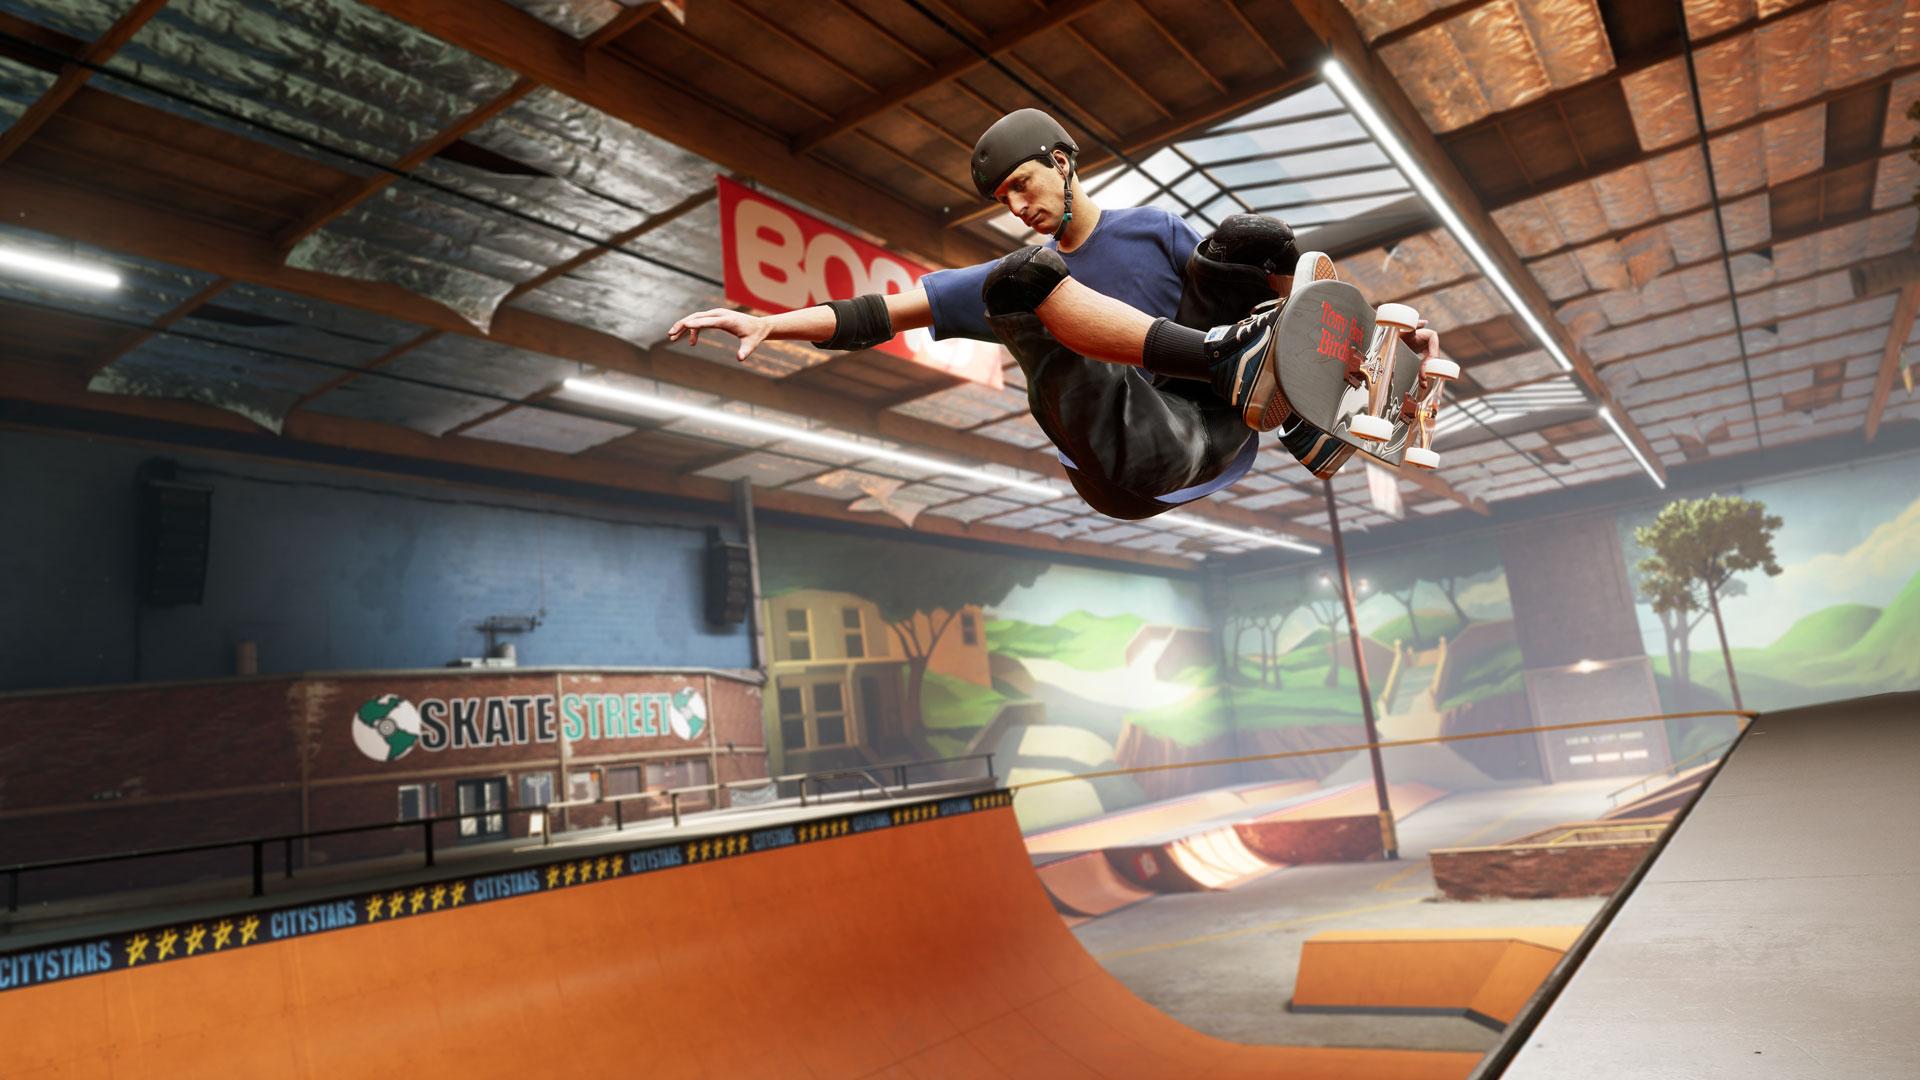 Tony Hawk's Pro Skater 1 + 2 - Feature Image